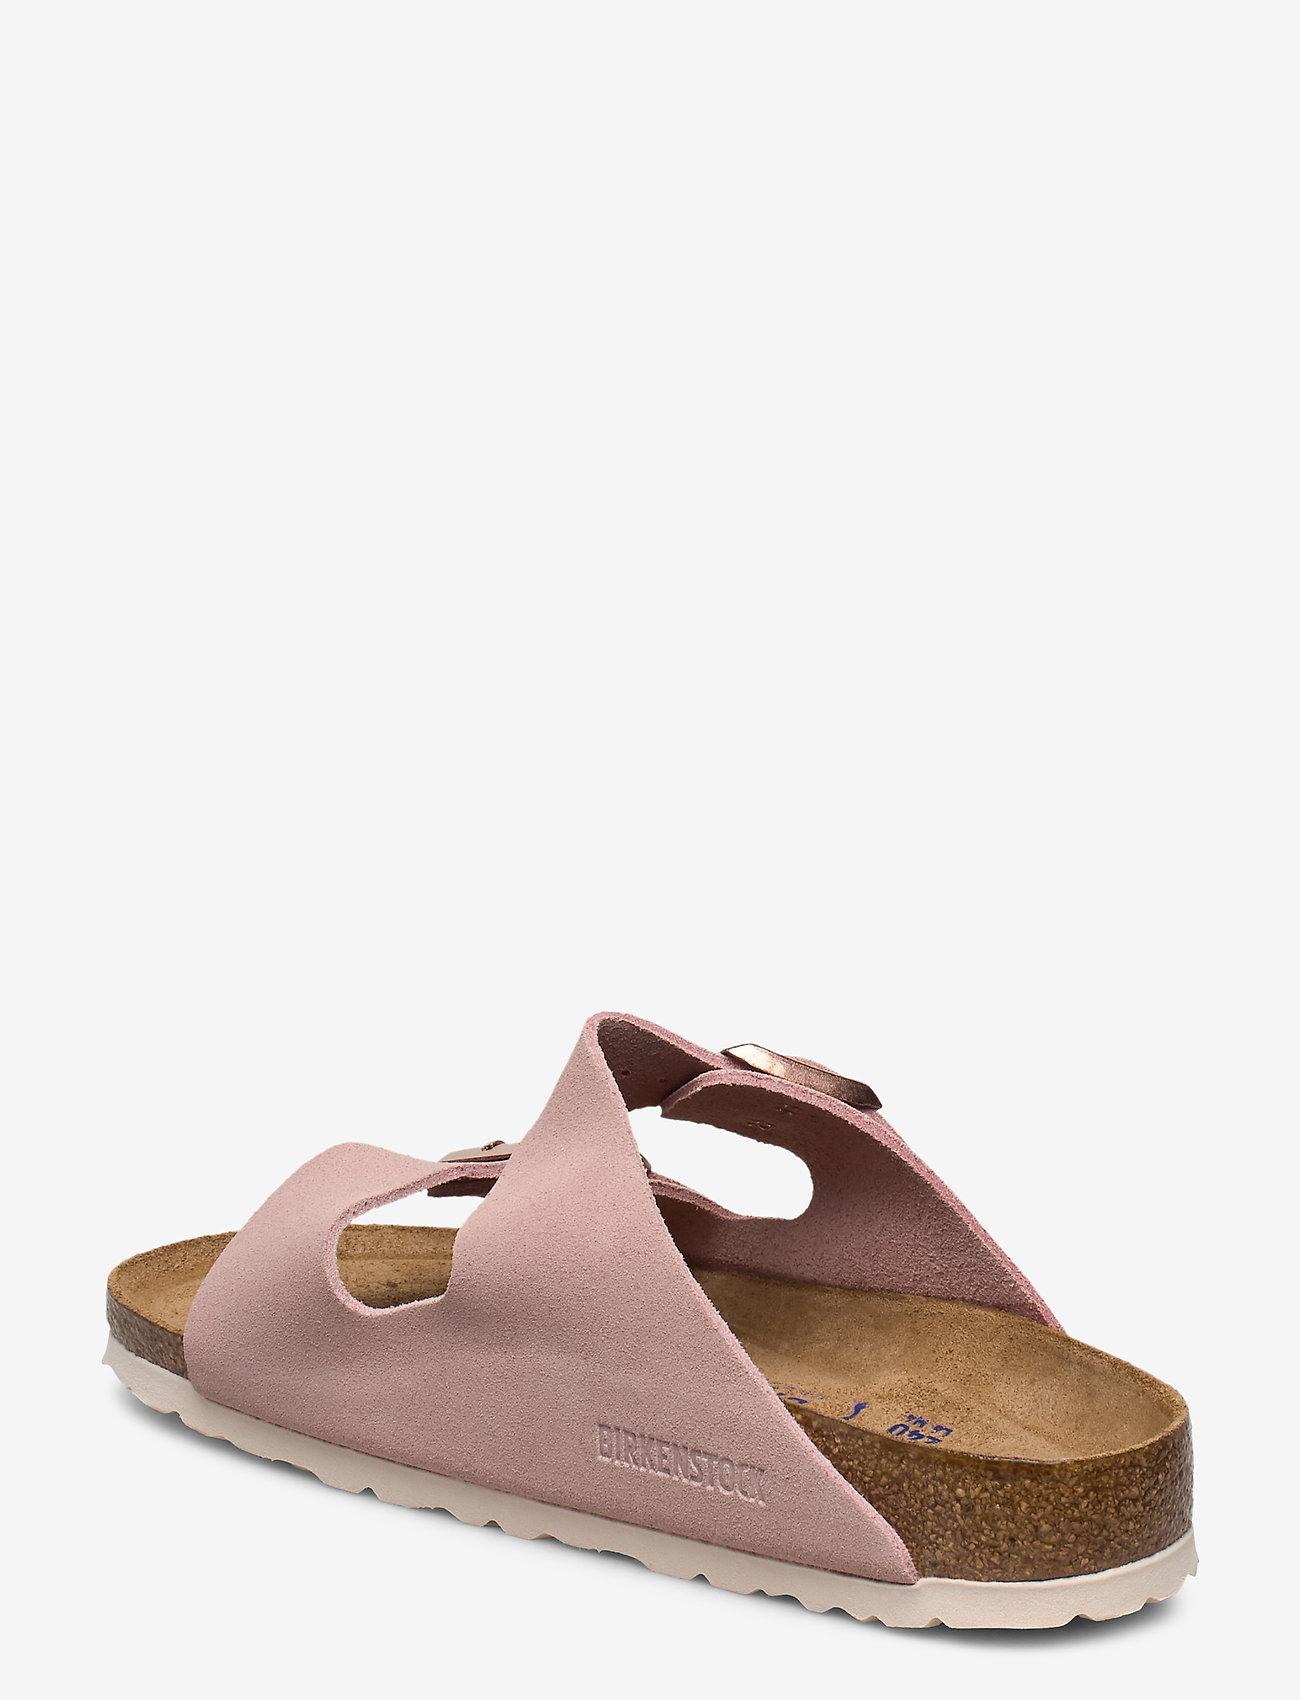 Birkenstock - Arizona Soft Footbed - light rose - 2